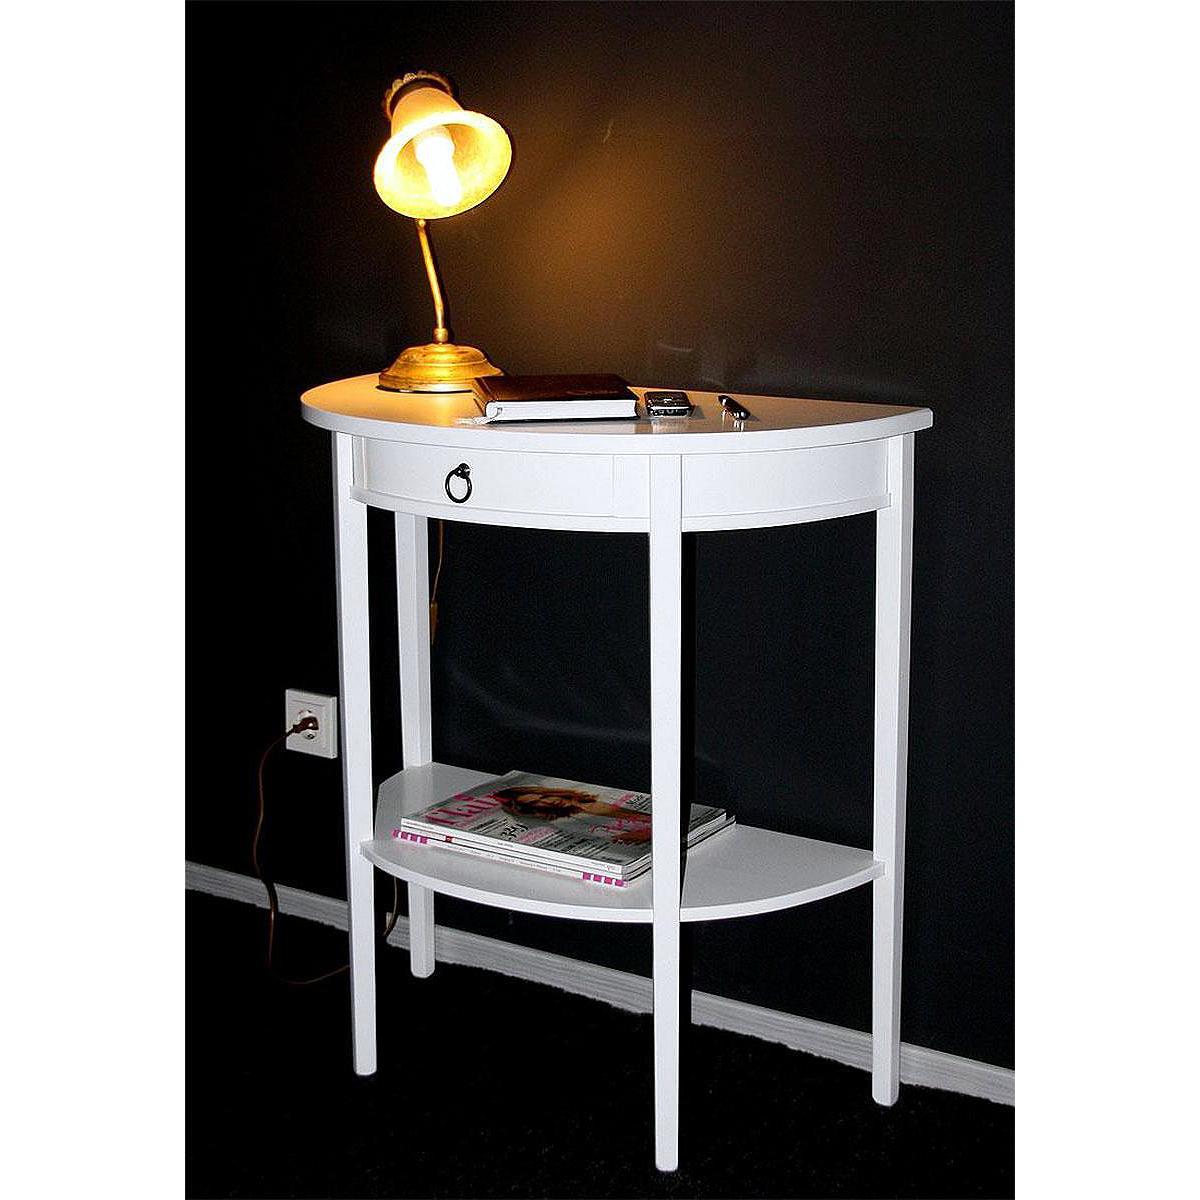 wei e m bel vollholz italienische m bel von casa de mobila. Black Bedroom Furniture Sets. Home Design Ideas